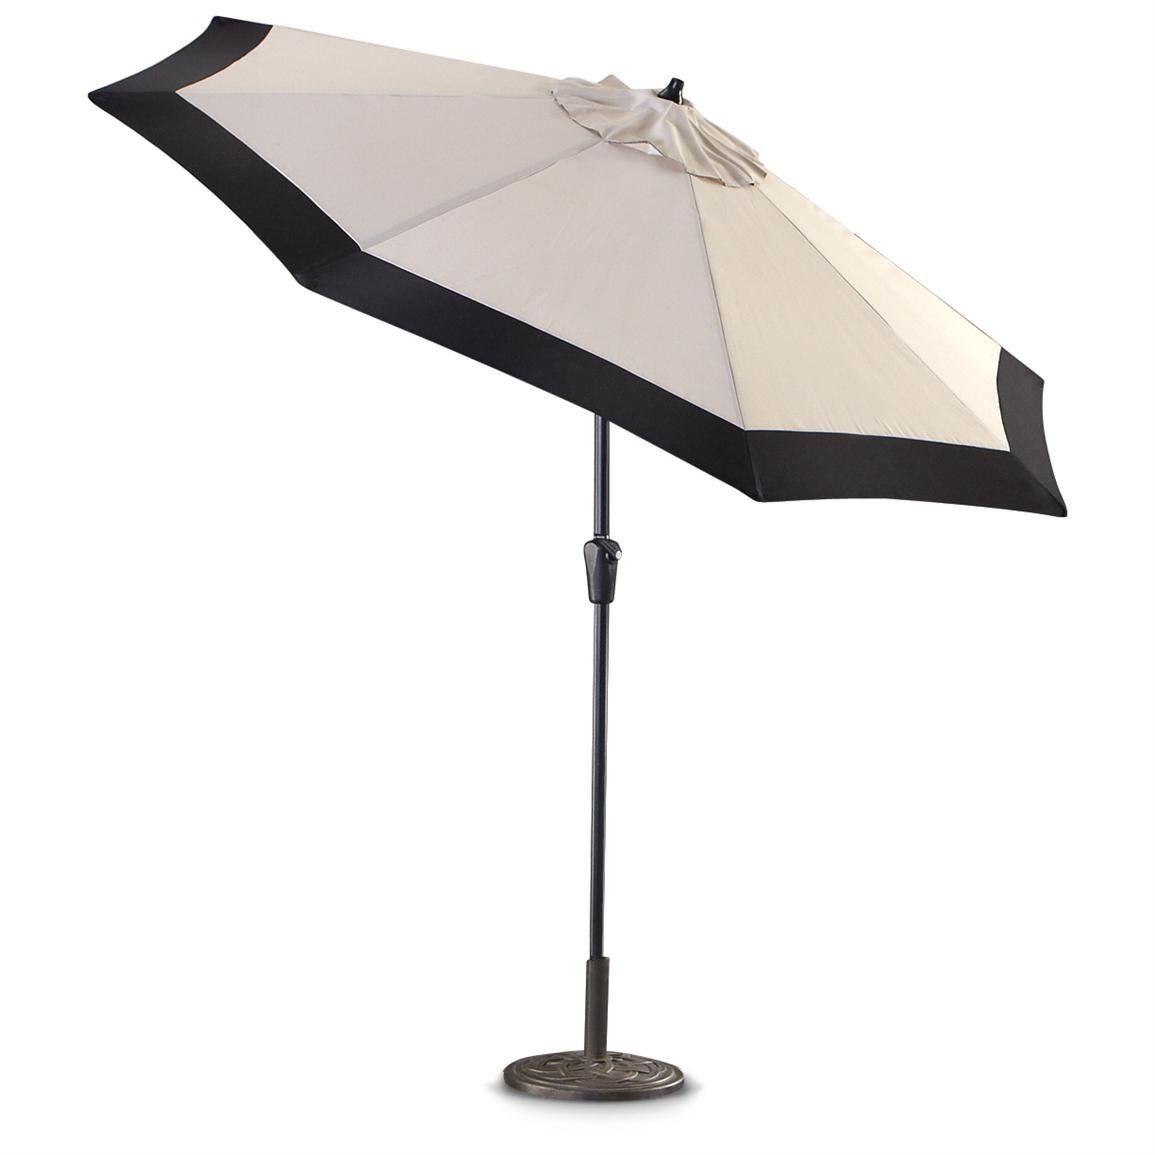 Incroyable White Patio Umbrellas #5: Castlecreek 9 Two Tone Deluxe Market Patio  Umbrella Khaki Black Rectangular Patio Umbrella